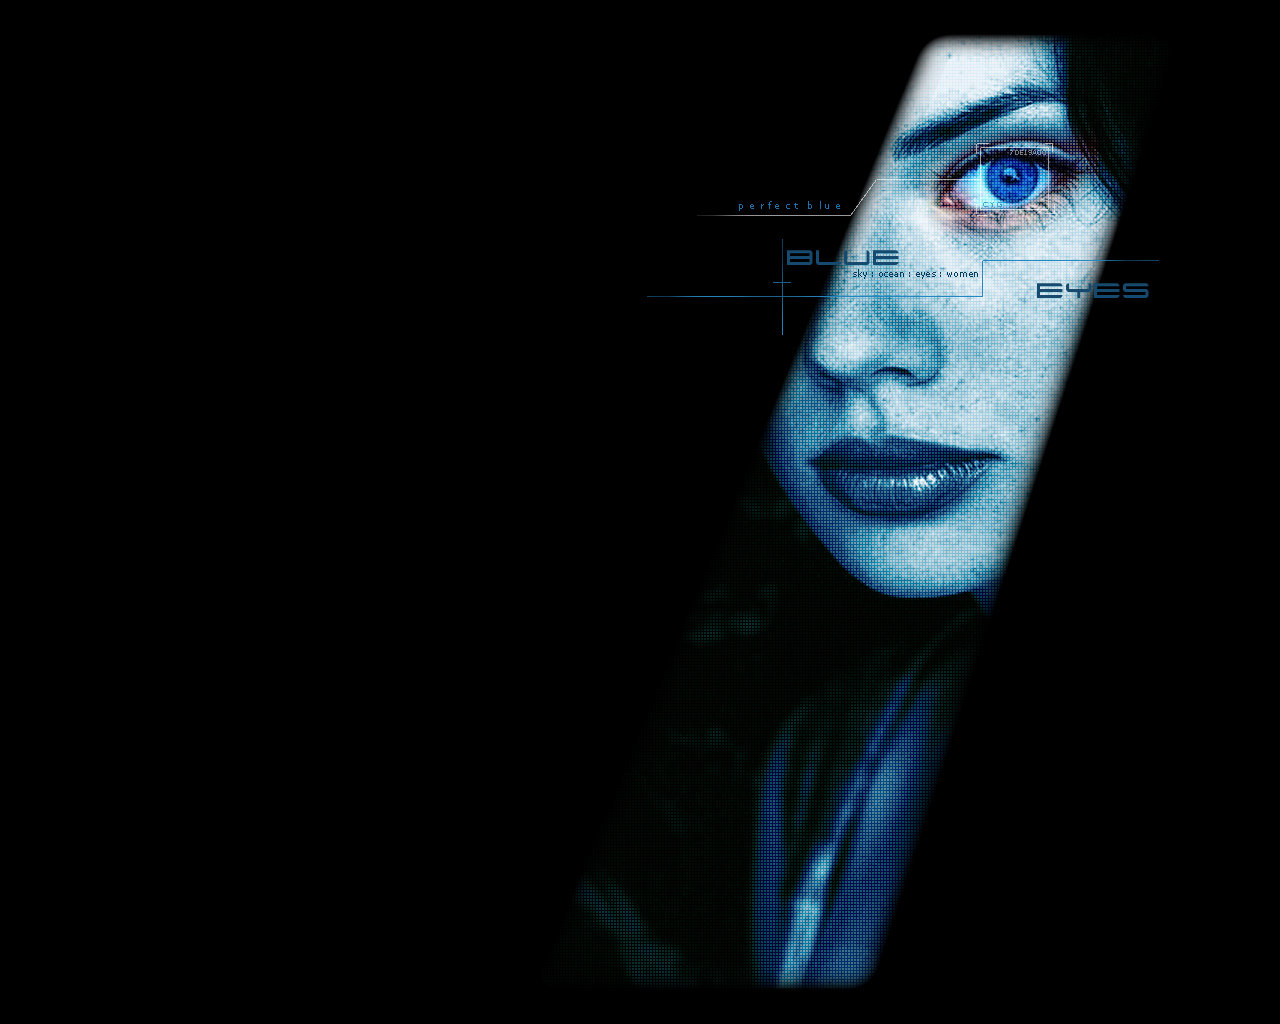 http://2.bp.blogspot.com/-w1k8uuoUwt4/UITLTKft6rI/AAAAAAAAJTg/9AfT165mjDQ/s1600/black-wallpaper-17.jpg